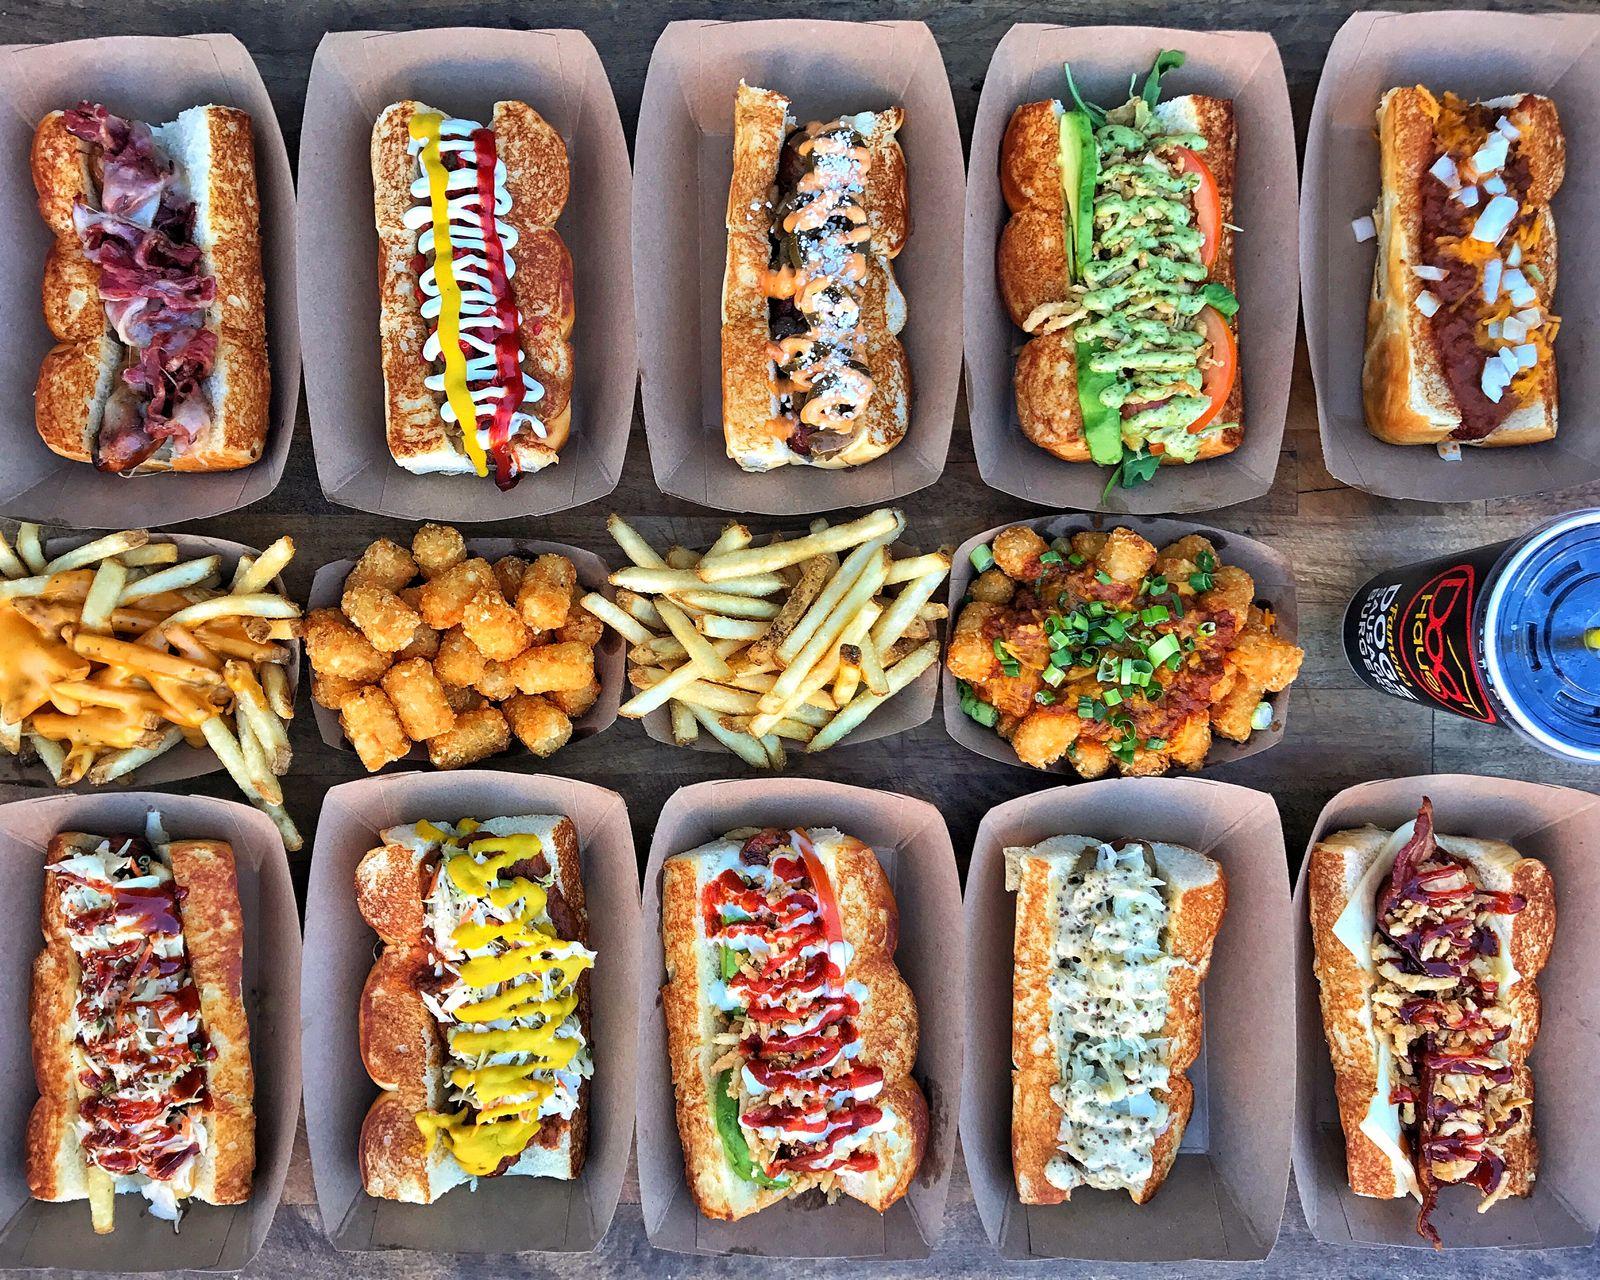 Dog Haus Celebrates Grand Opening of Second Houston Restaurant